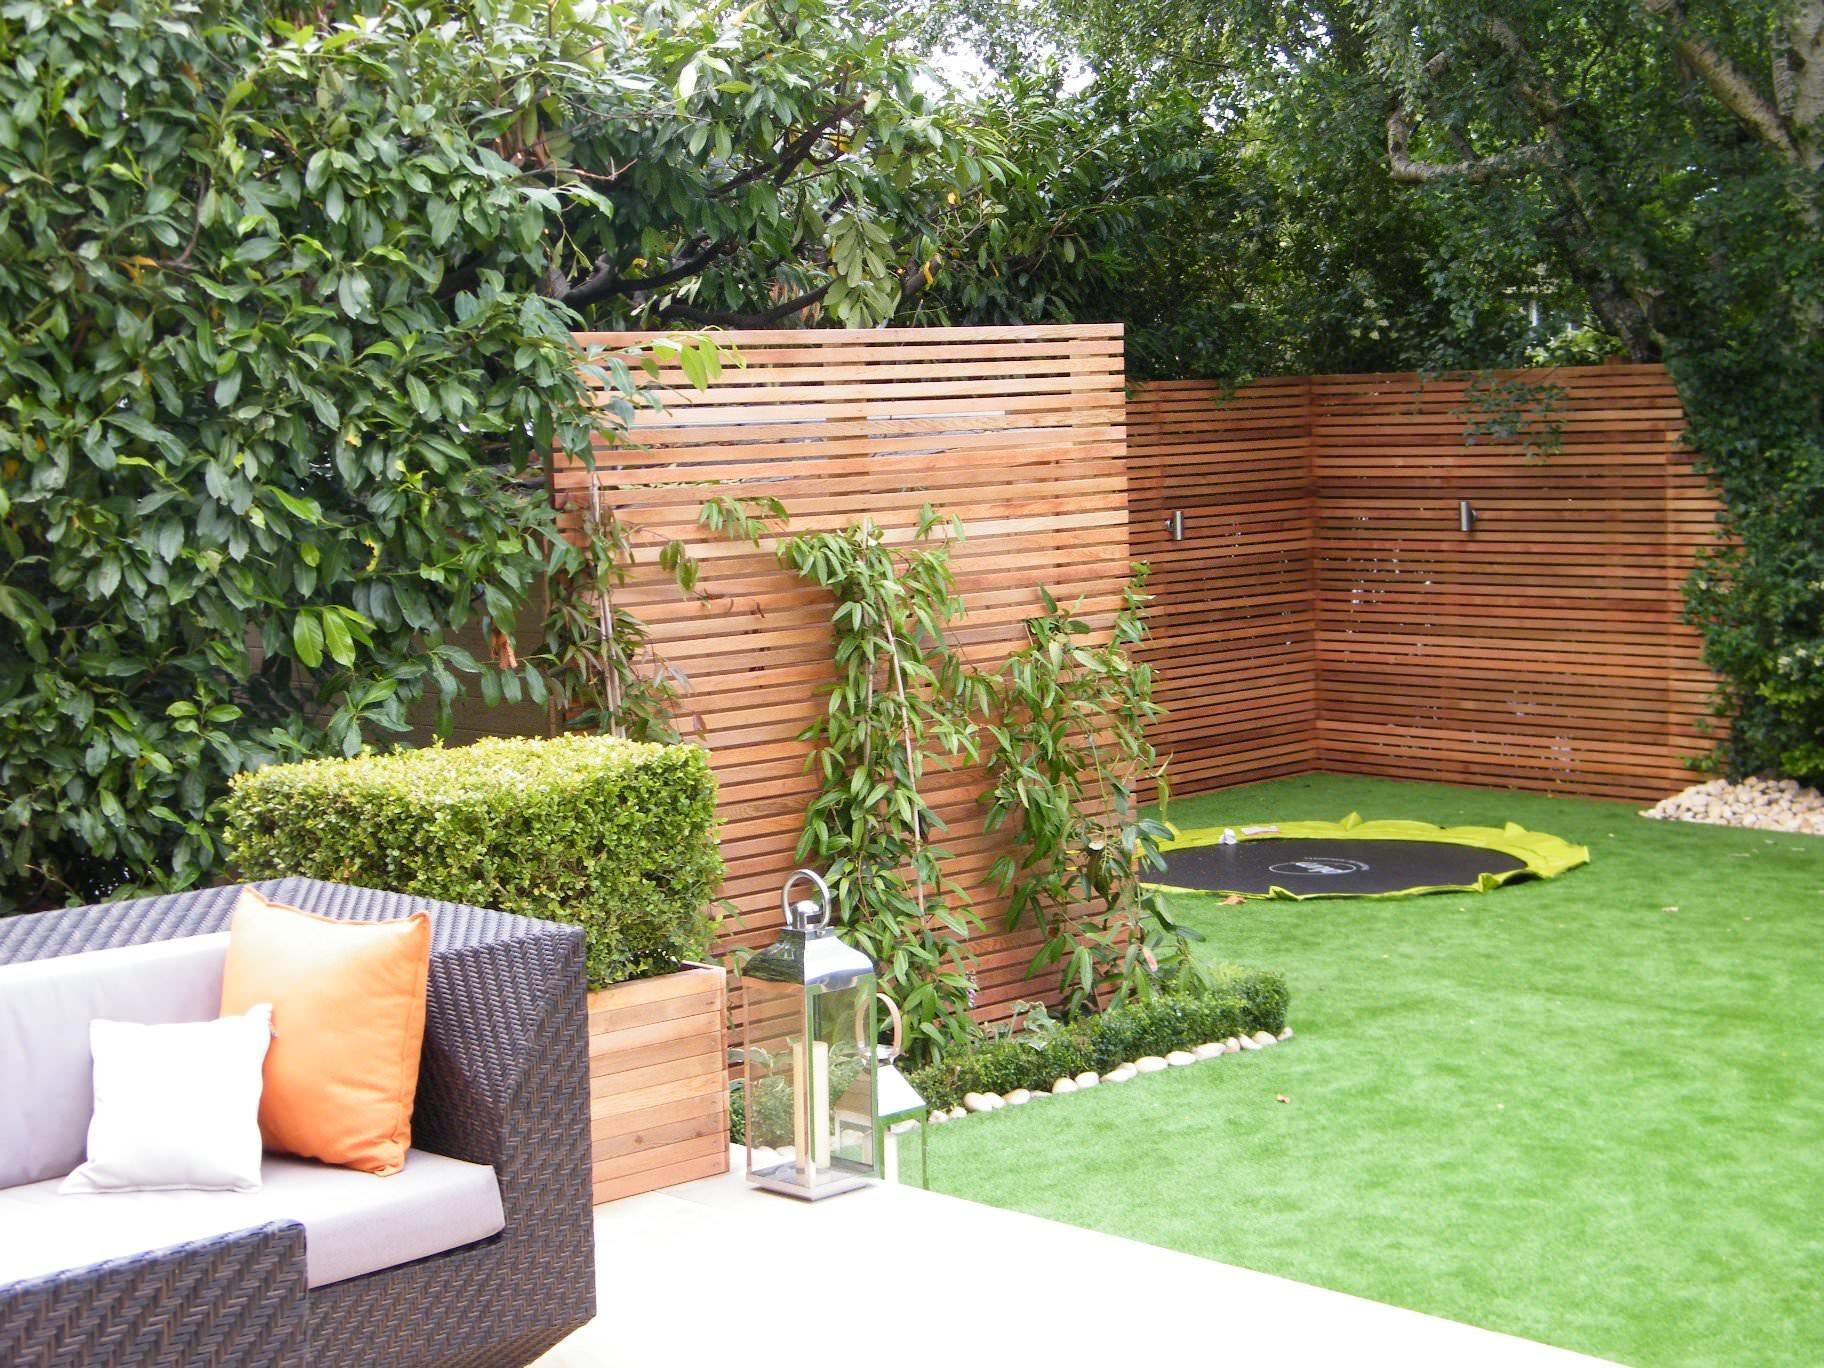 5 Garden Design Ideas for a Small Garden - Floral & Hardy on Small Backyard Landscaping id=38248